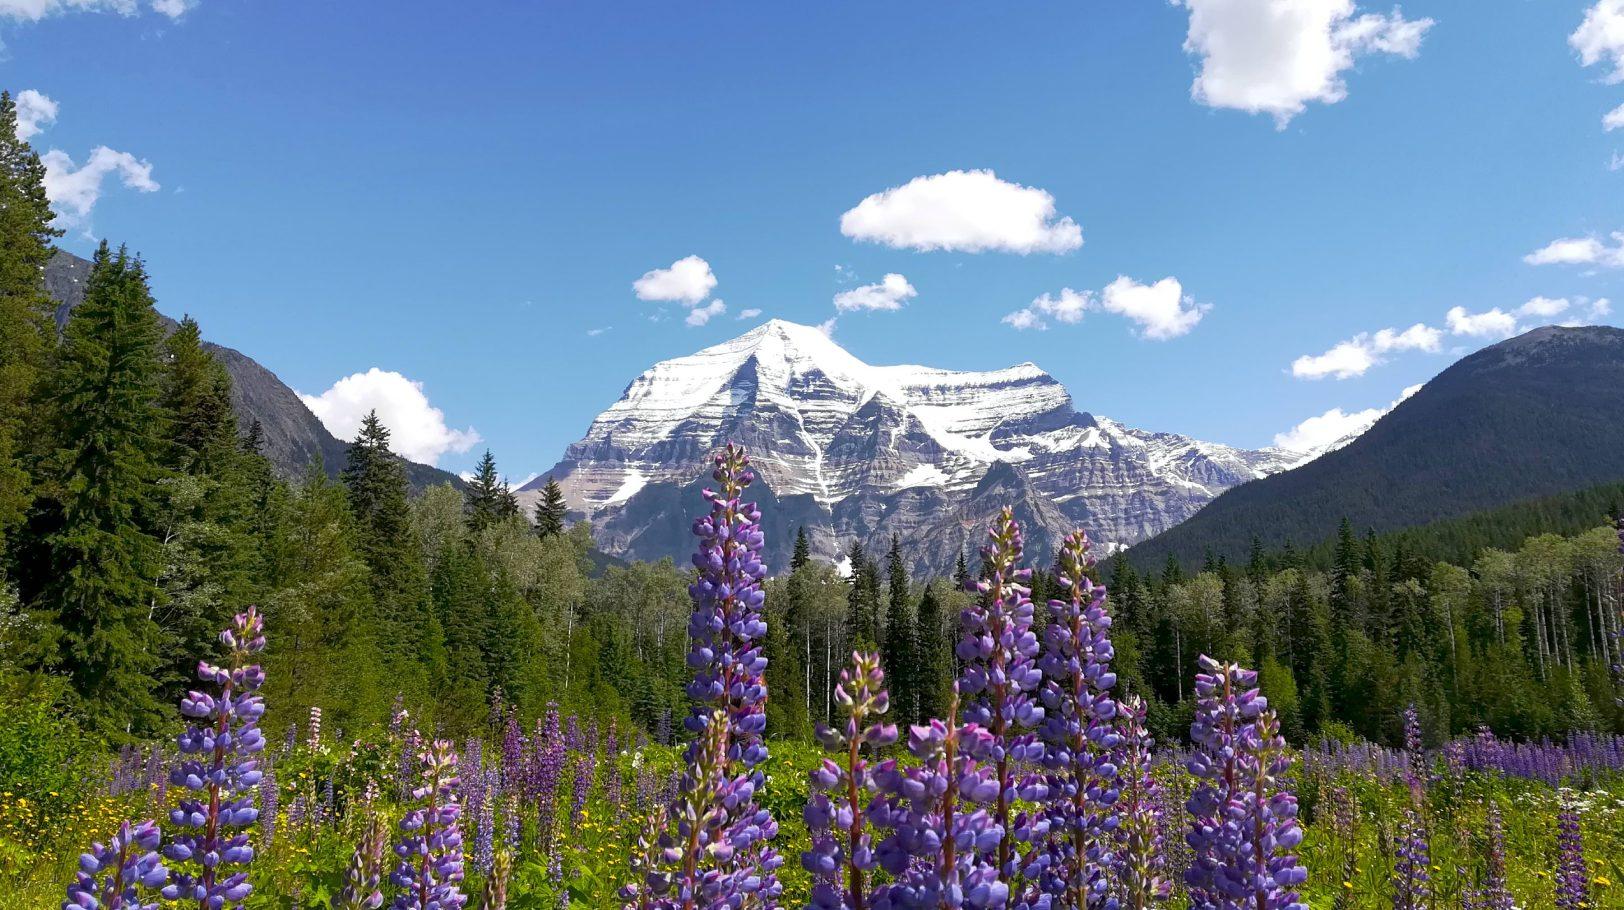 Visitar Mount Robson Provincial Park